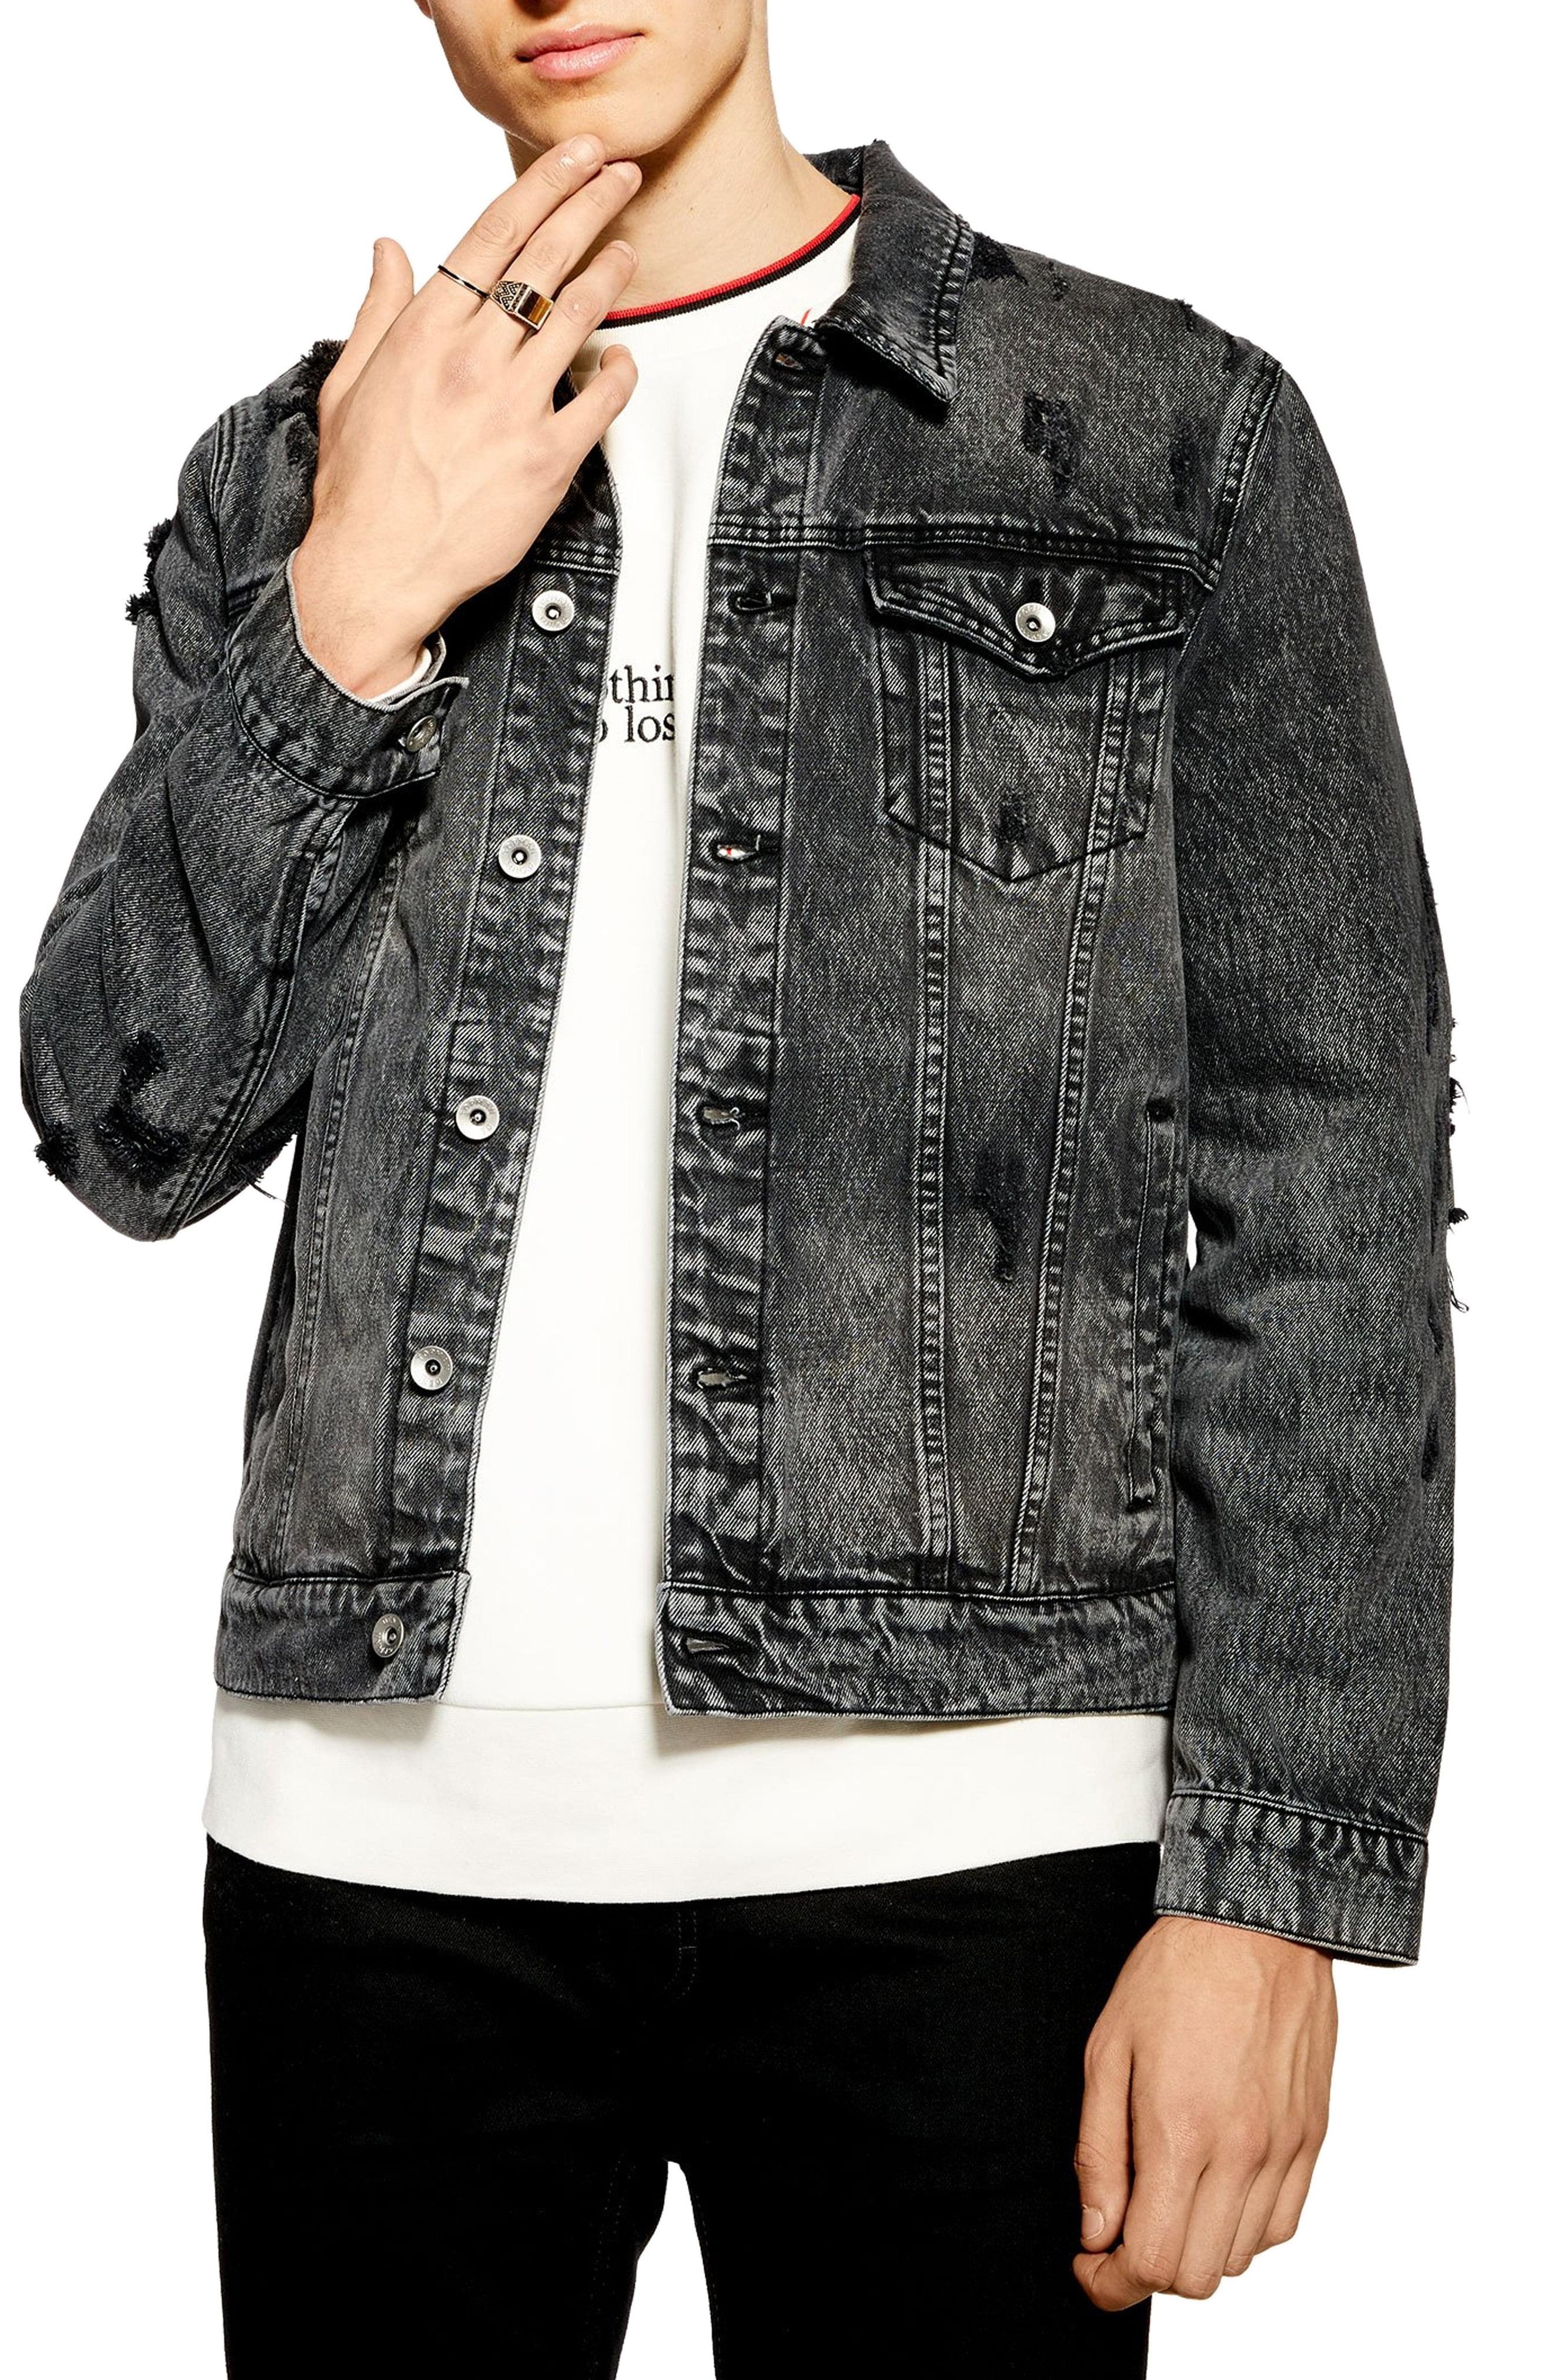 8baedcd4e83 Men's Topman Distressed Denim Jacket | The Fashionisto